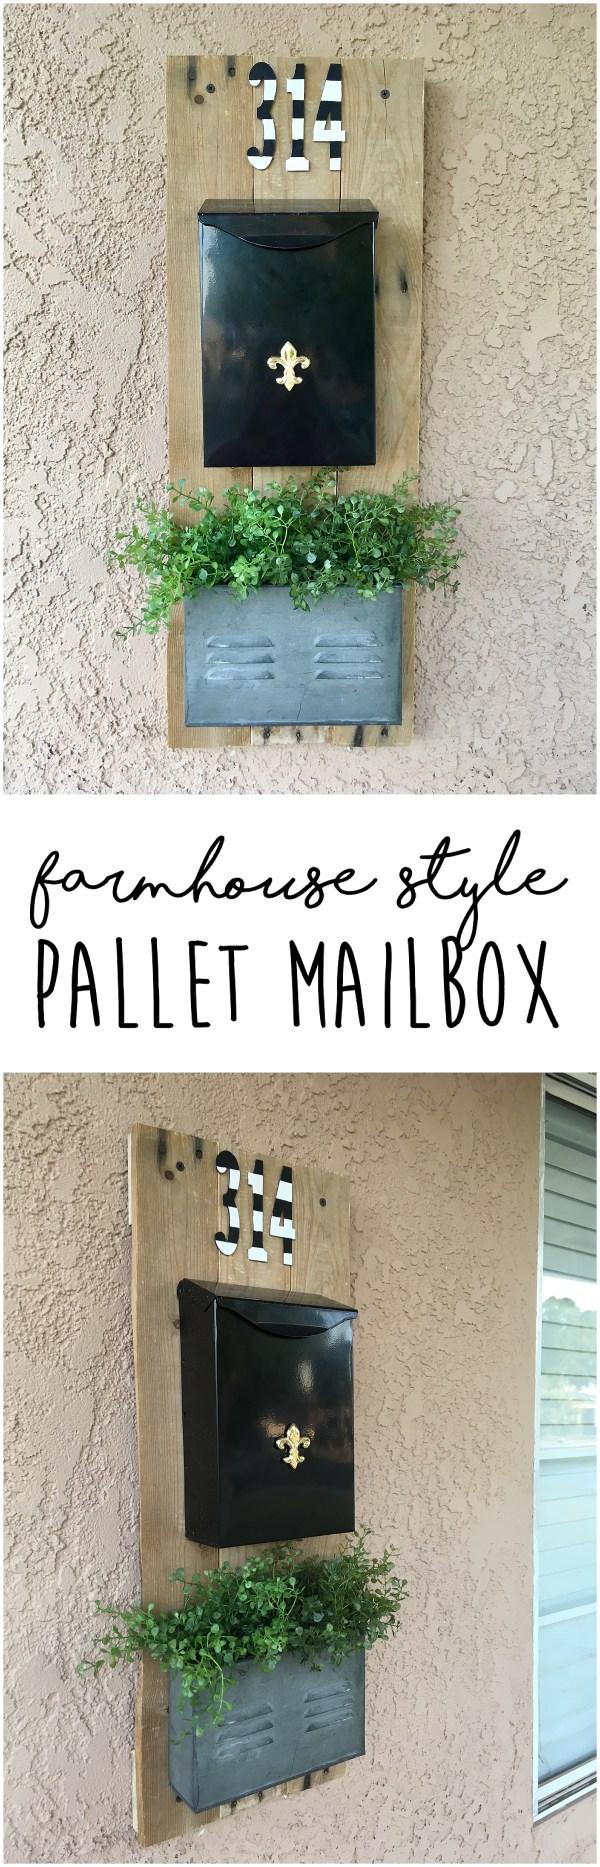 DIY Farmhouse Mailbox | Farmhouse Decor | Pallet Projects | Pallet Furniture | Pallet Ideas | Wood Signs | Rustic Home Decor | Mailbox Ideas | Mailbox Makeover